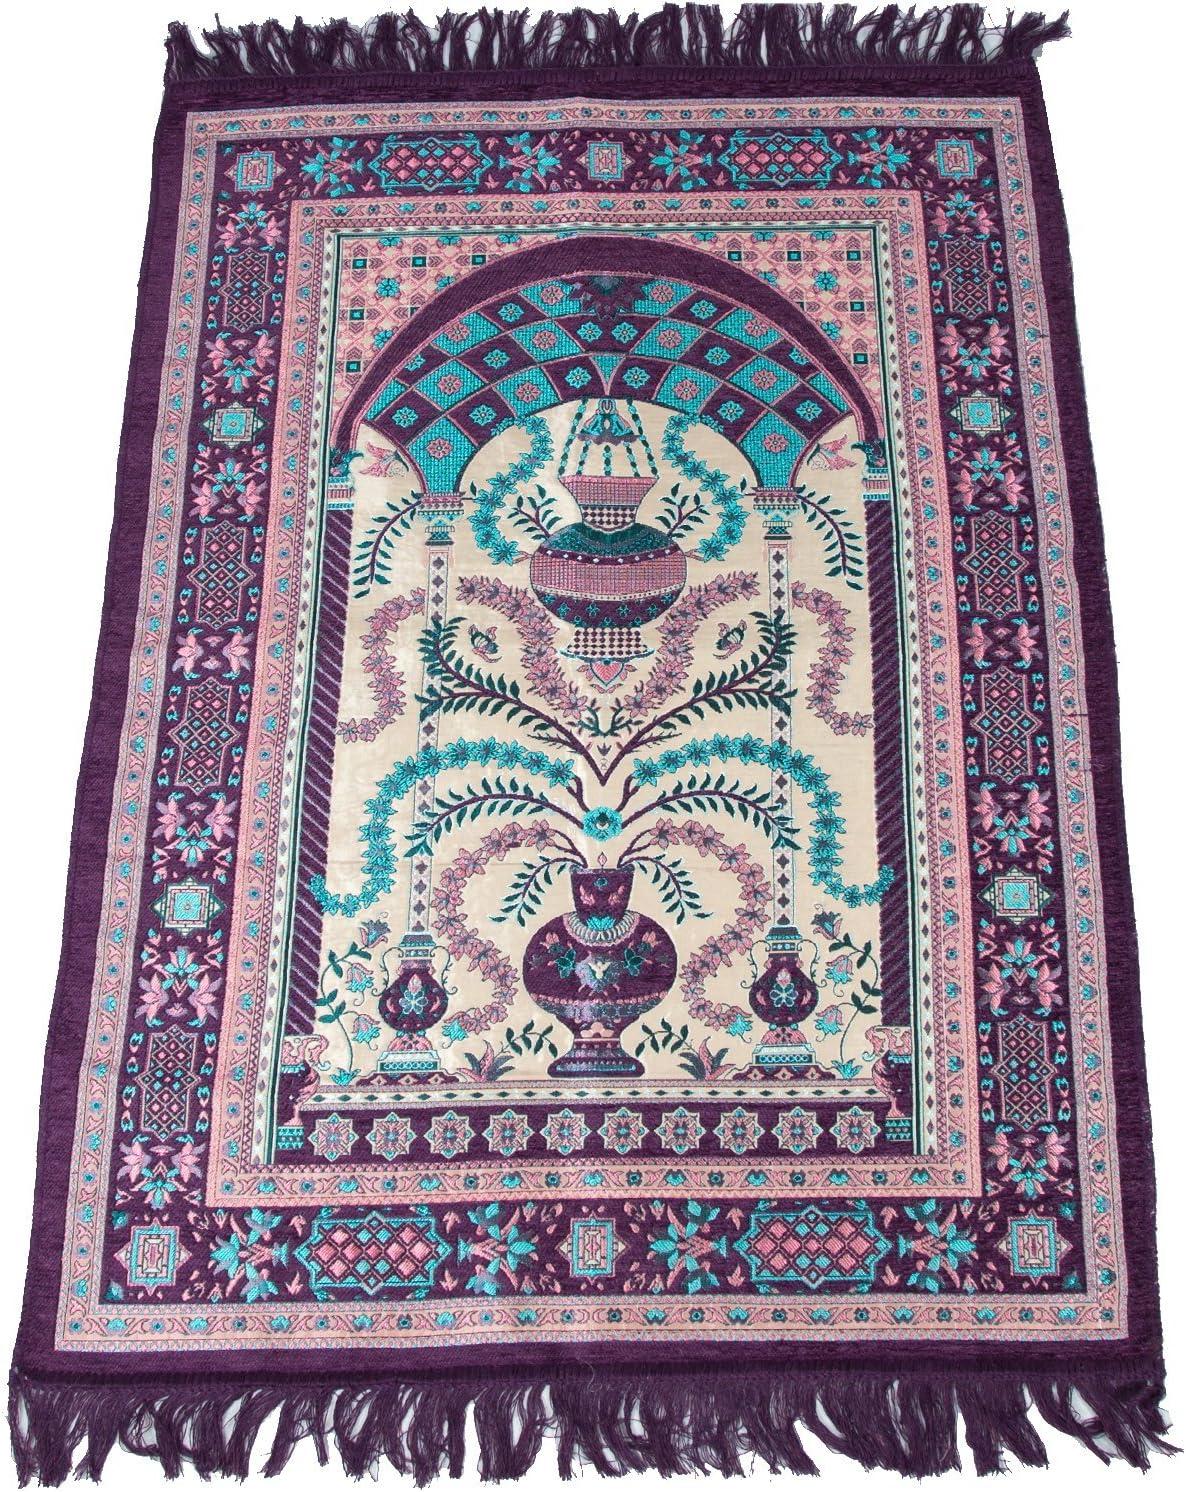 tapis de priere musulman tapis de priere islamique janamaz sajadah namaz sajjadah violet